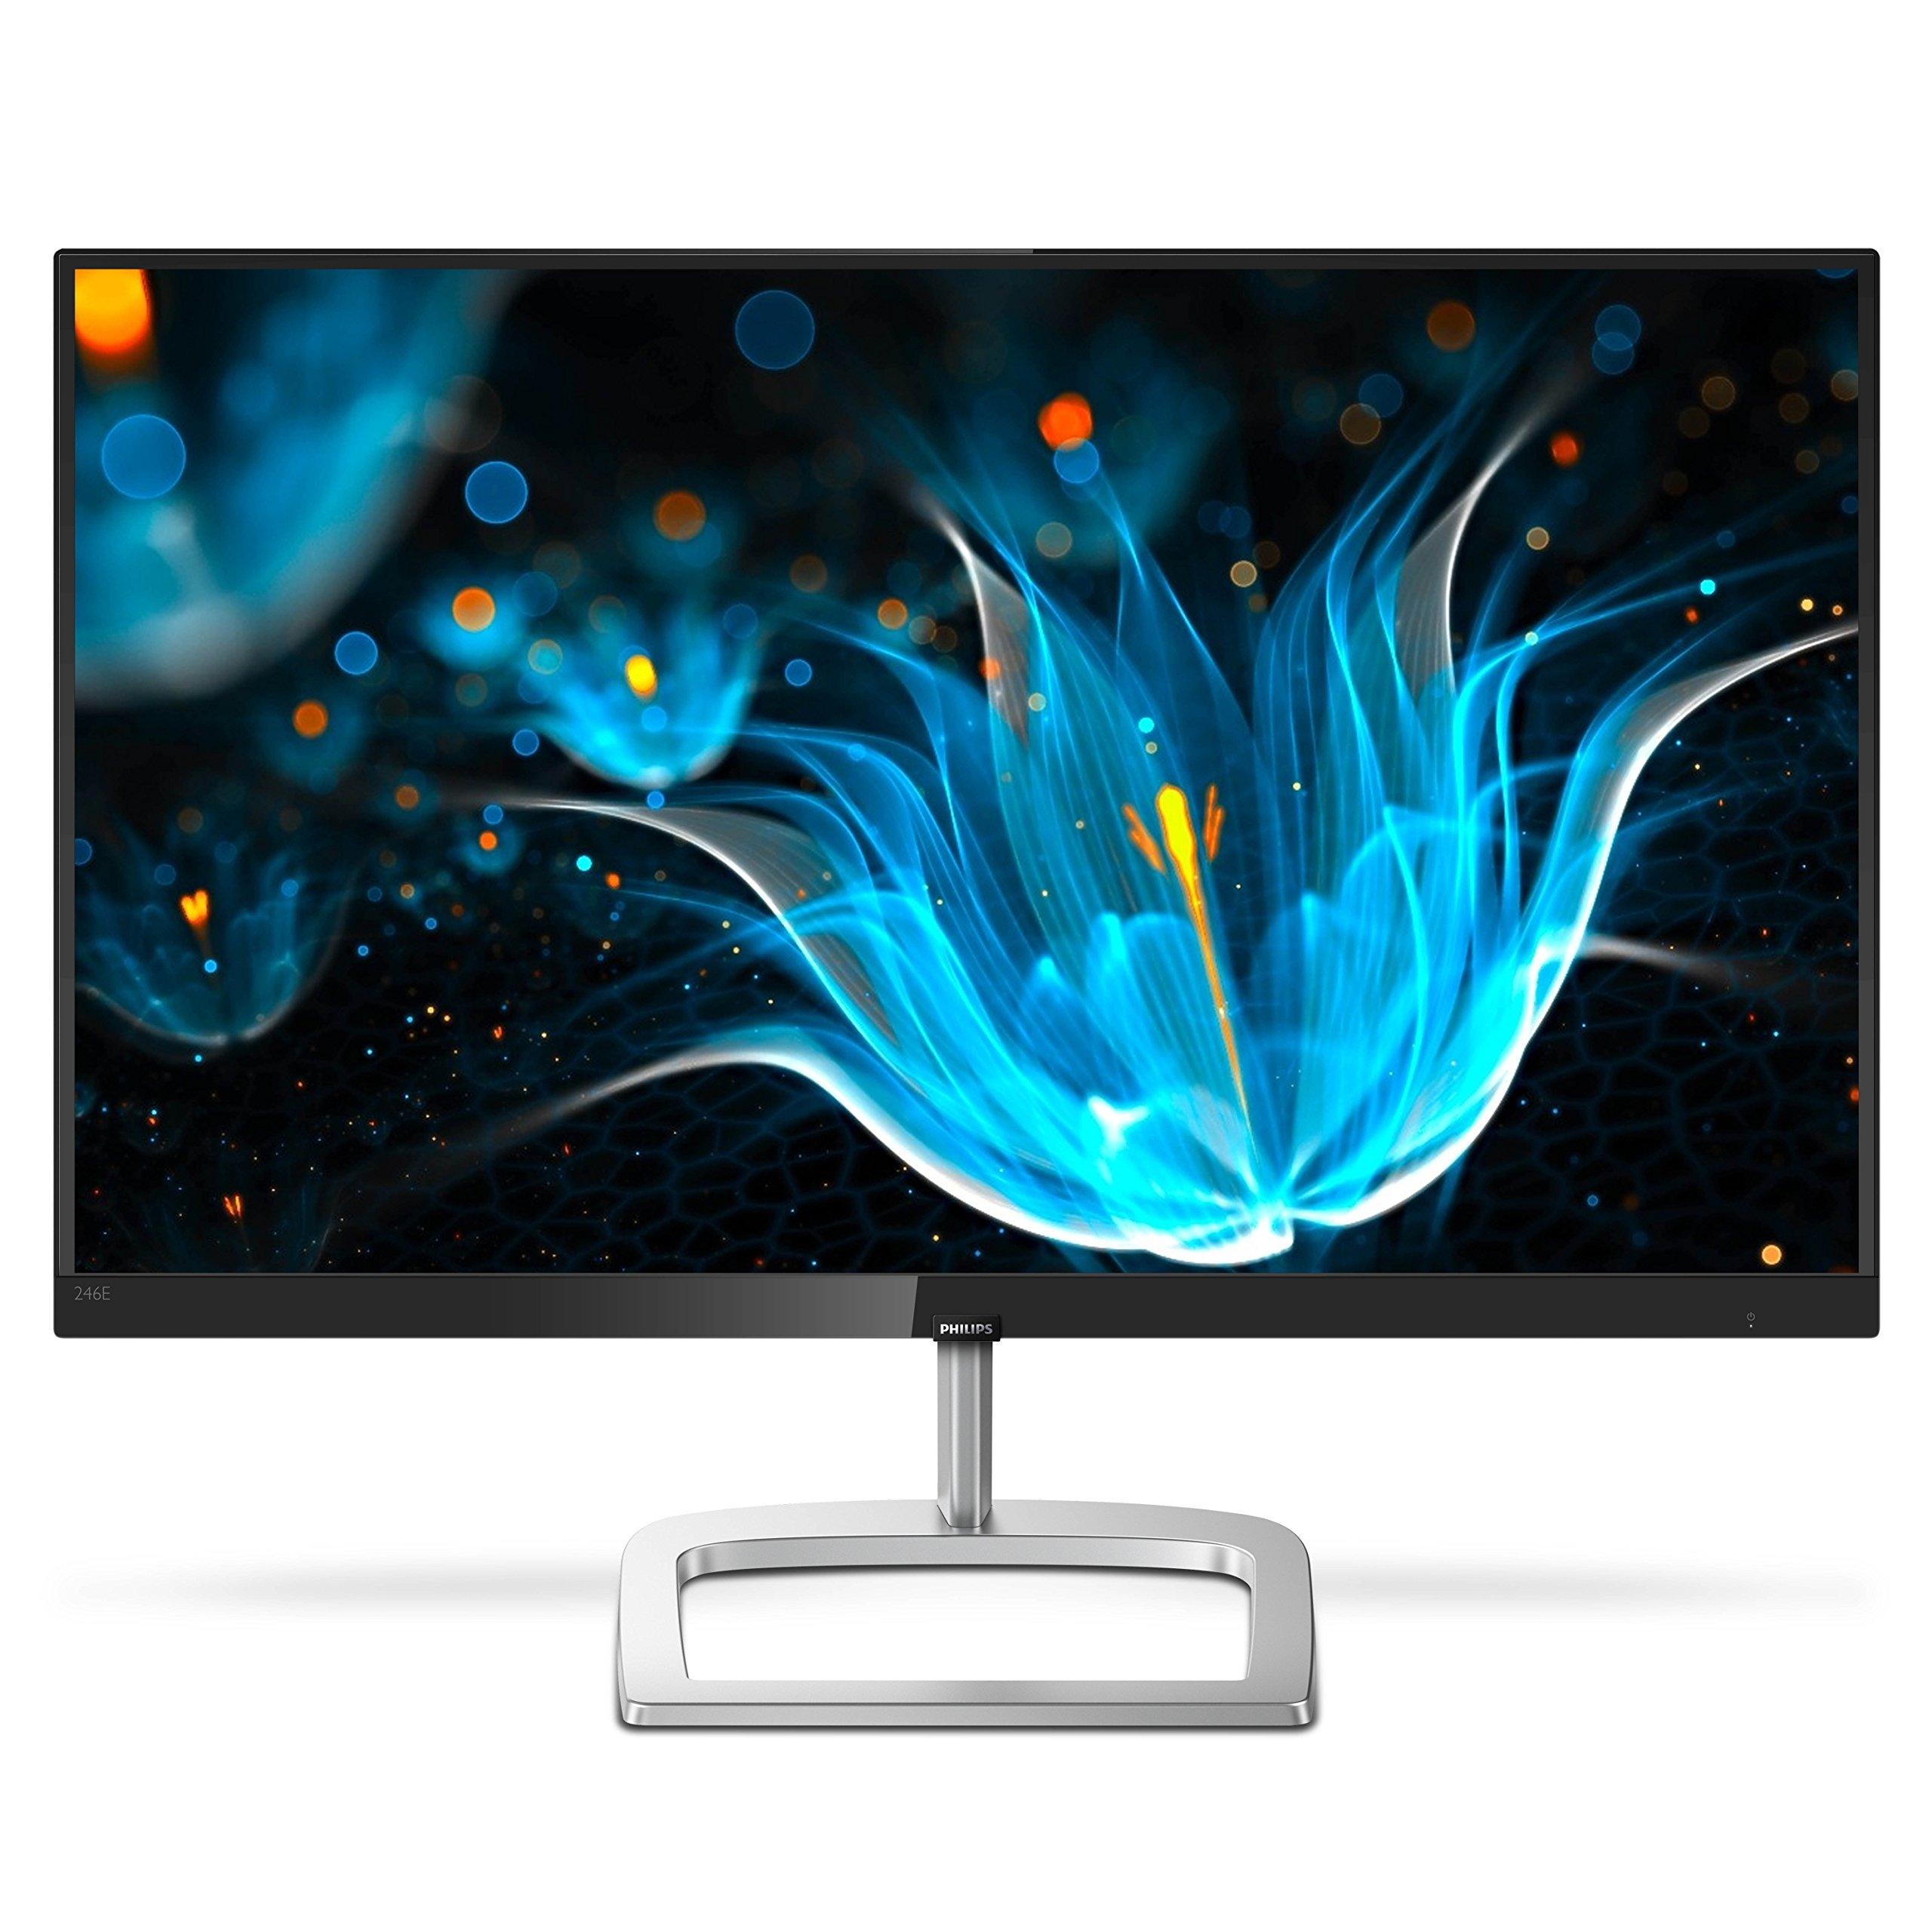 philips-246e9qdsb-24-frameless-monitor-full-hd-ips-129-srgb-75hz-freesync-vesa-4yr-advance-replacement-warranty